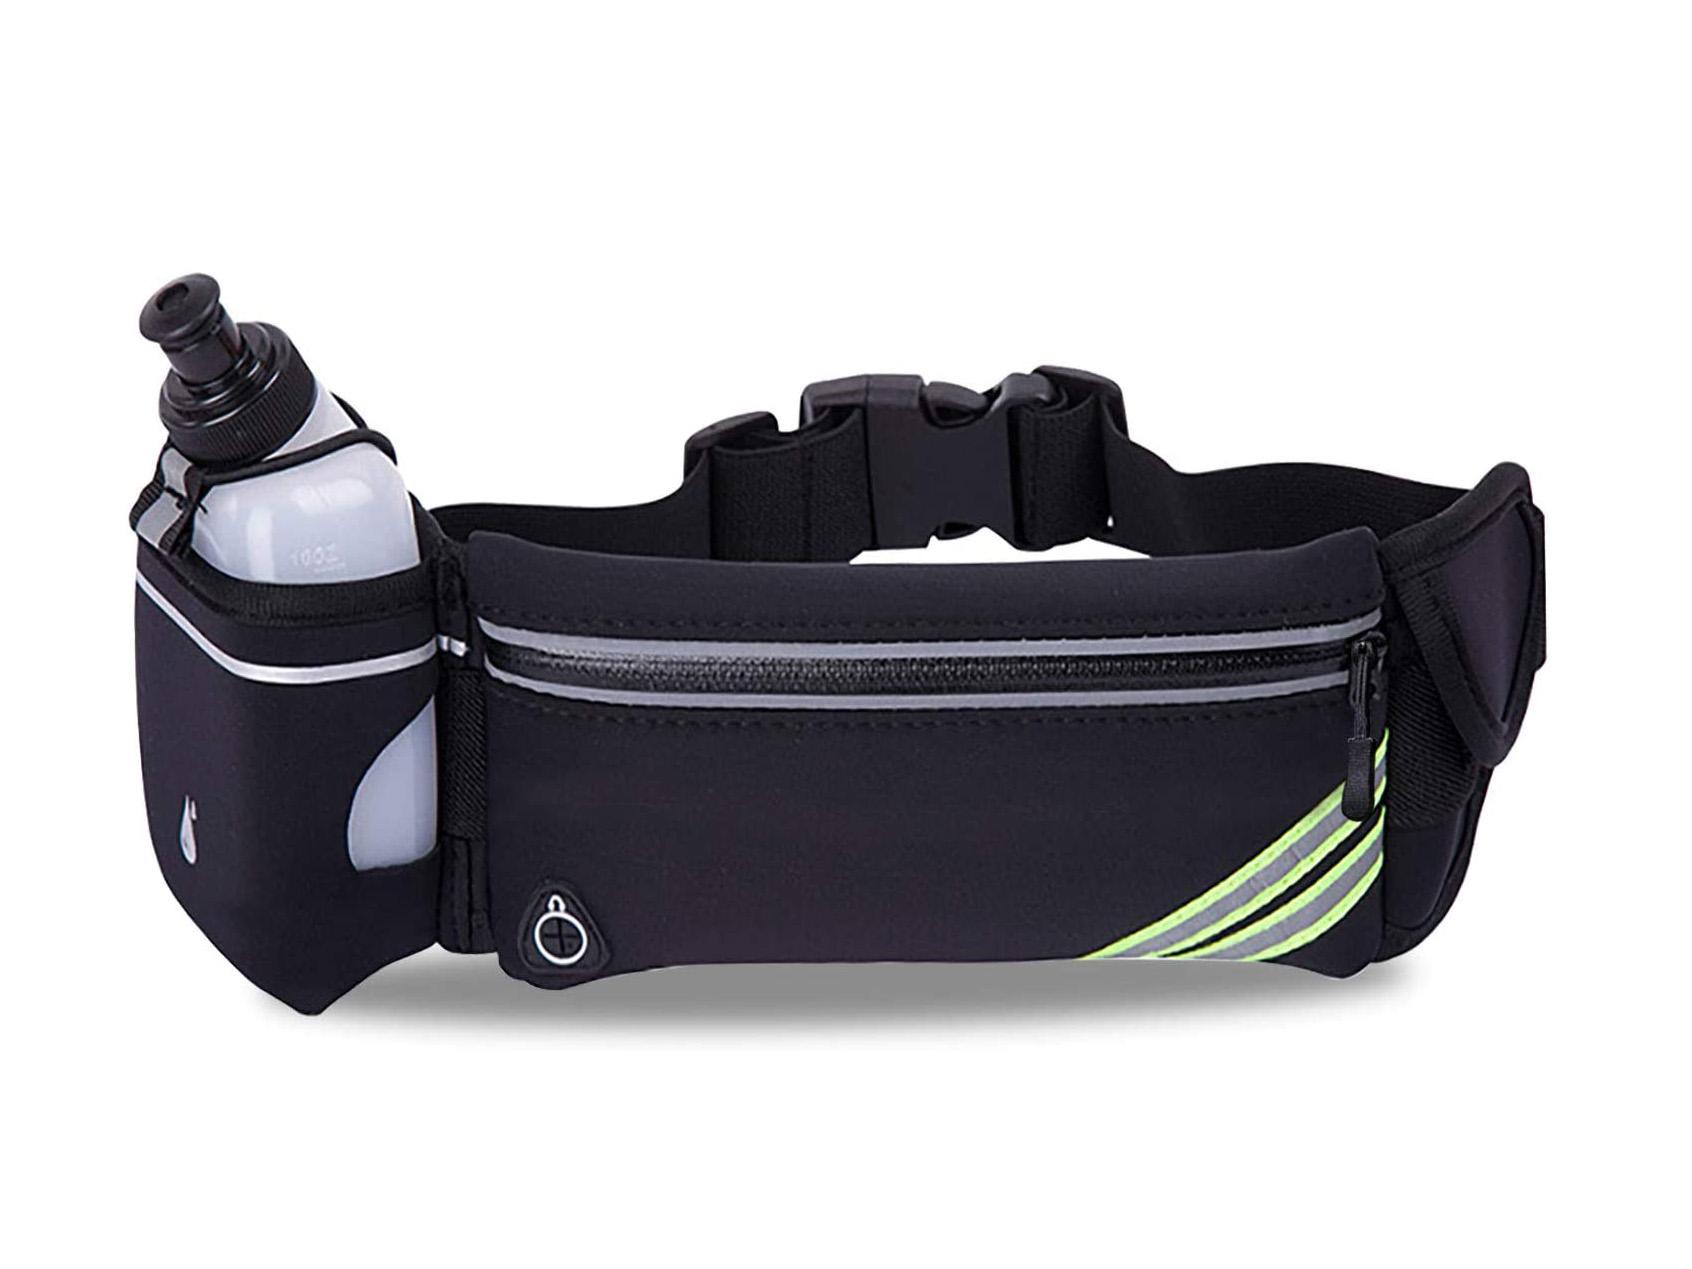 Best Running Accessories - Kehon Waterproof Hydration Belt